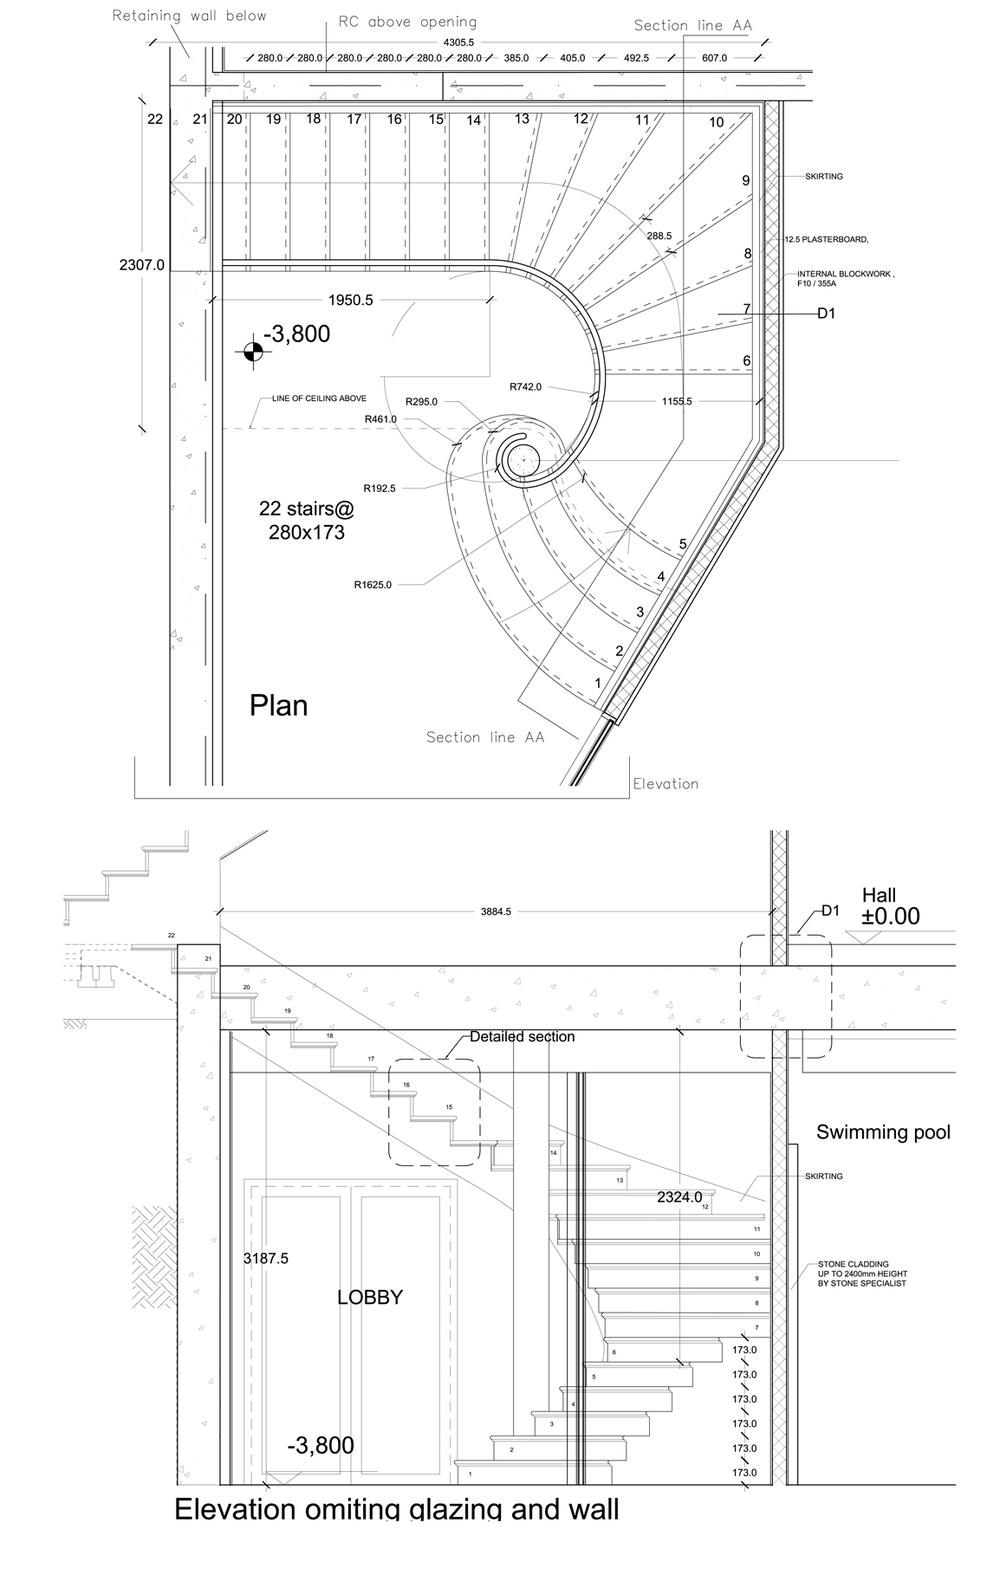 WSA0606 06-02 Stairs 2.jpg